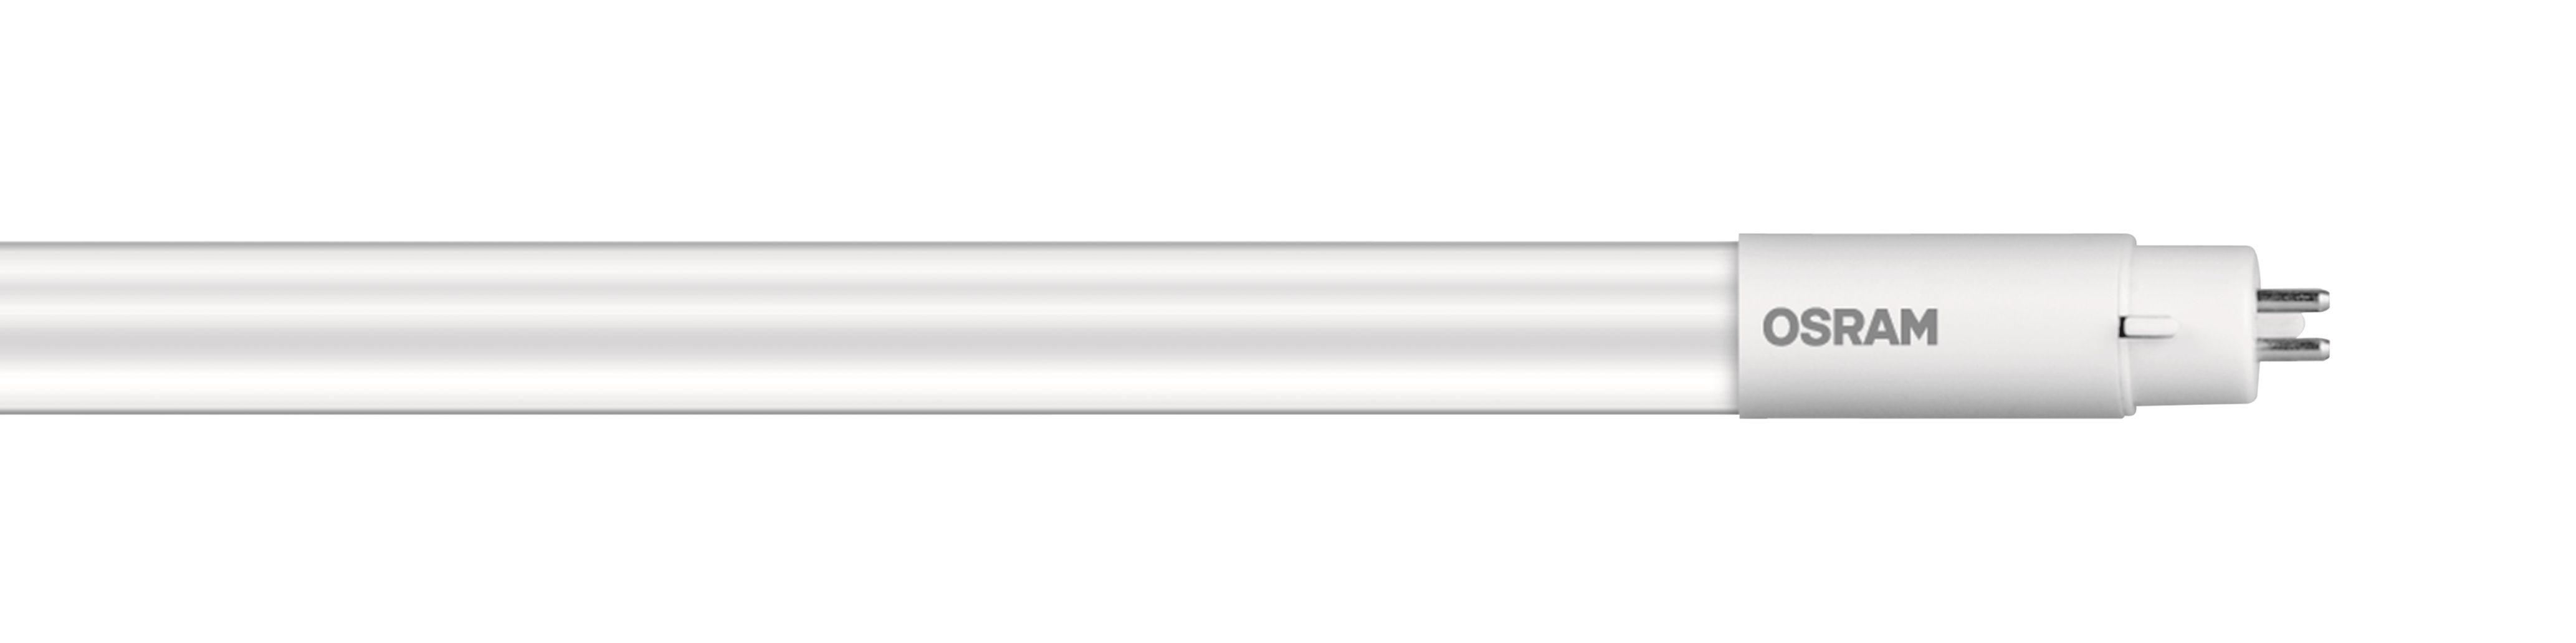 5c0b2441e3a9b40613c1e7c7e08e3da9 Wunderschöne Test Led Lampen Gu10 Dekorationen